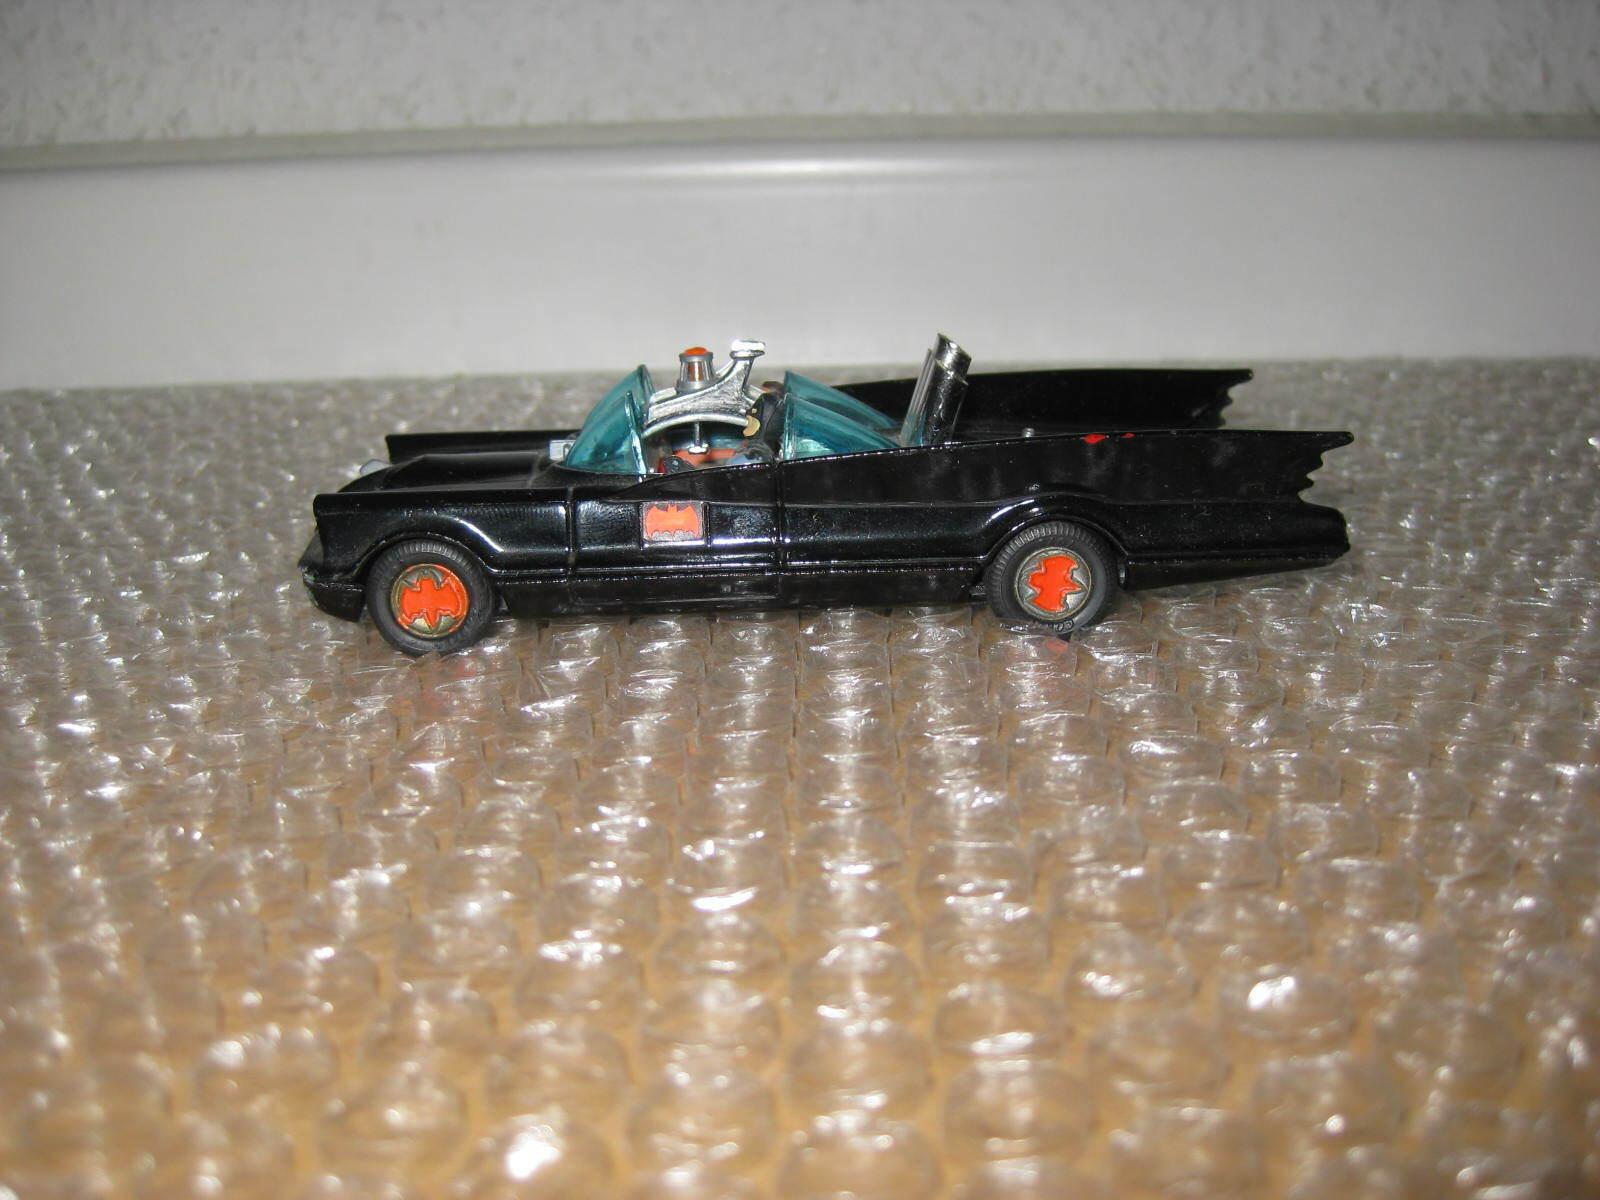 Corgi toys nº 267 Batmobile + original box s159